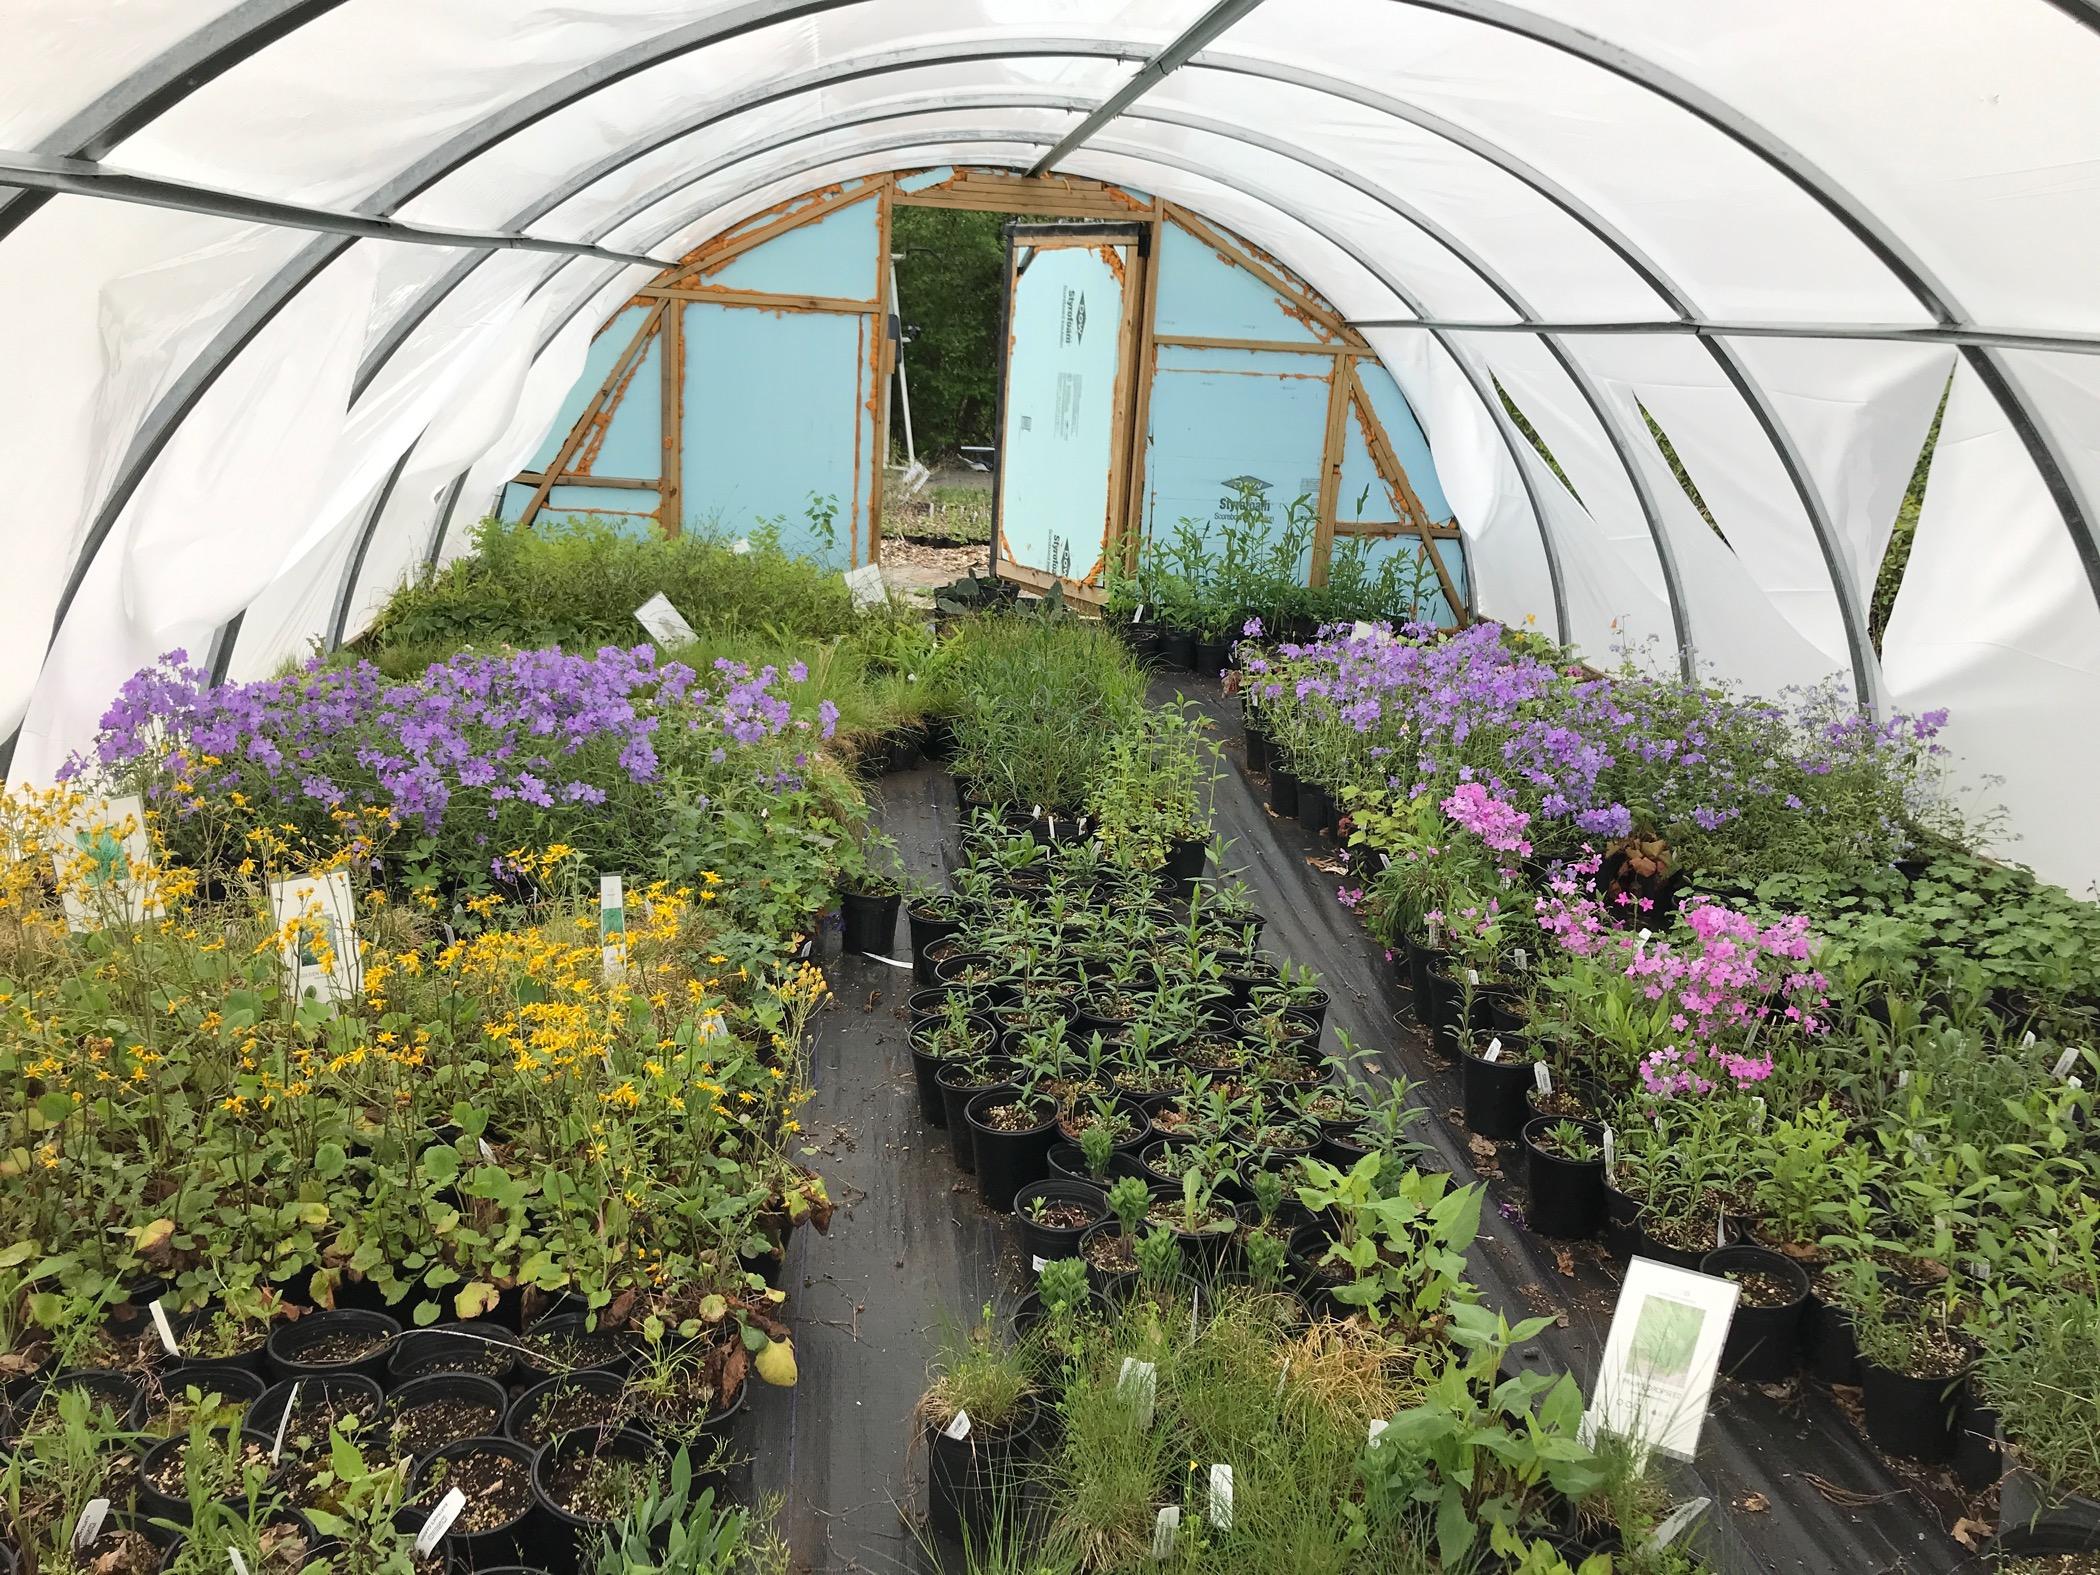 How To Start A Garden During Coronavirus Whyy